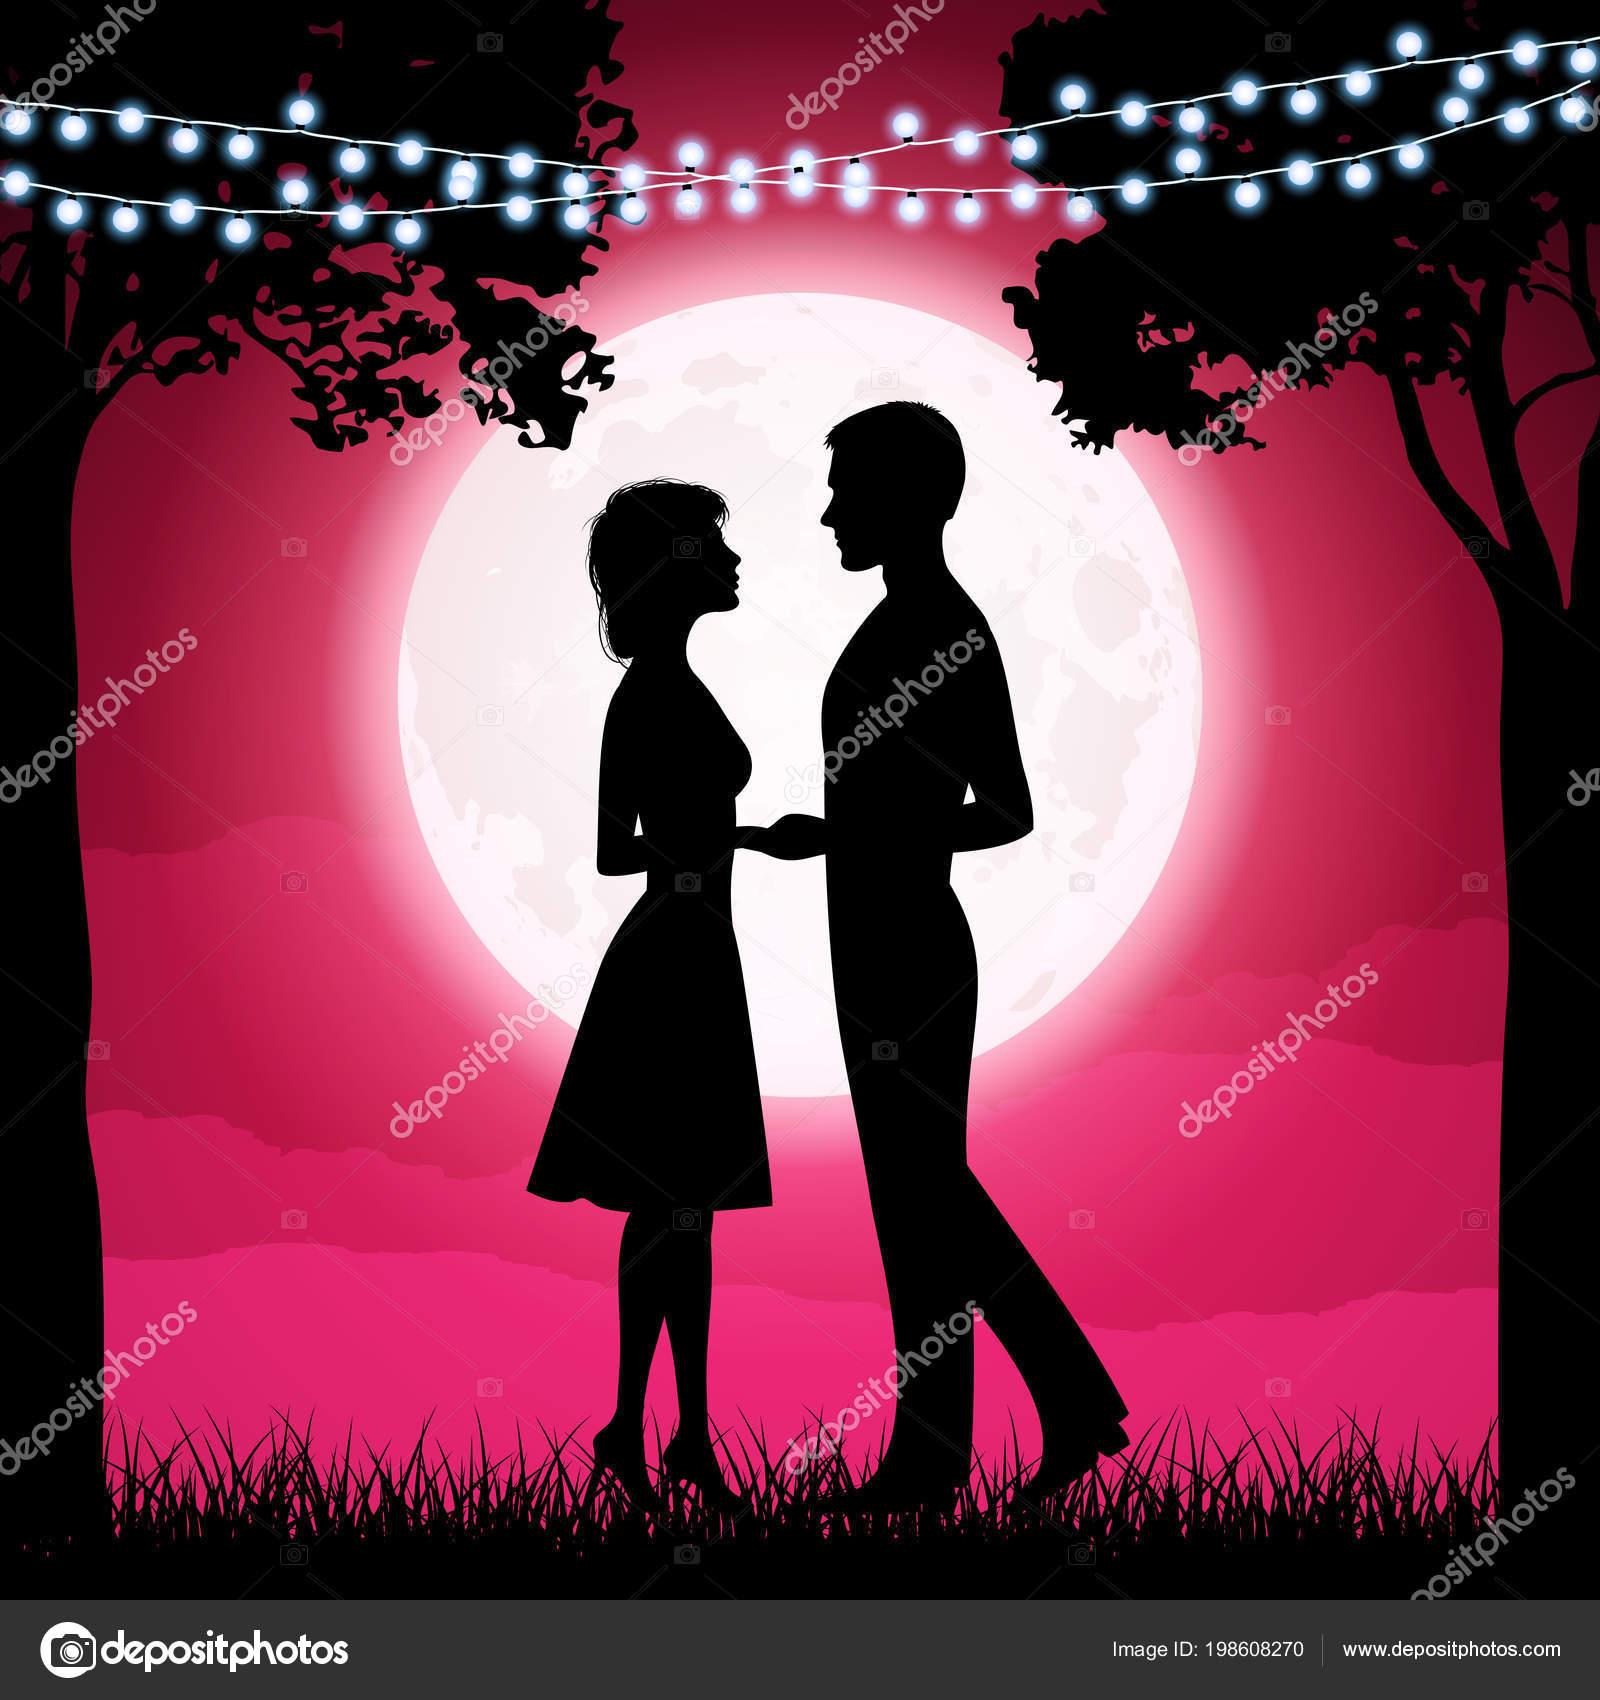 Silhouettes Young Woman Man Moon Background Girlfriend Boyfriend